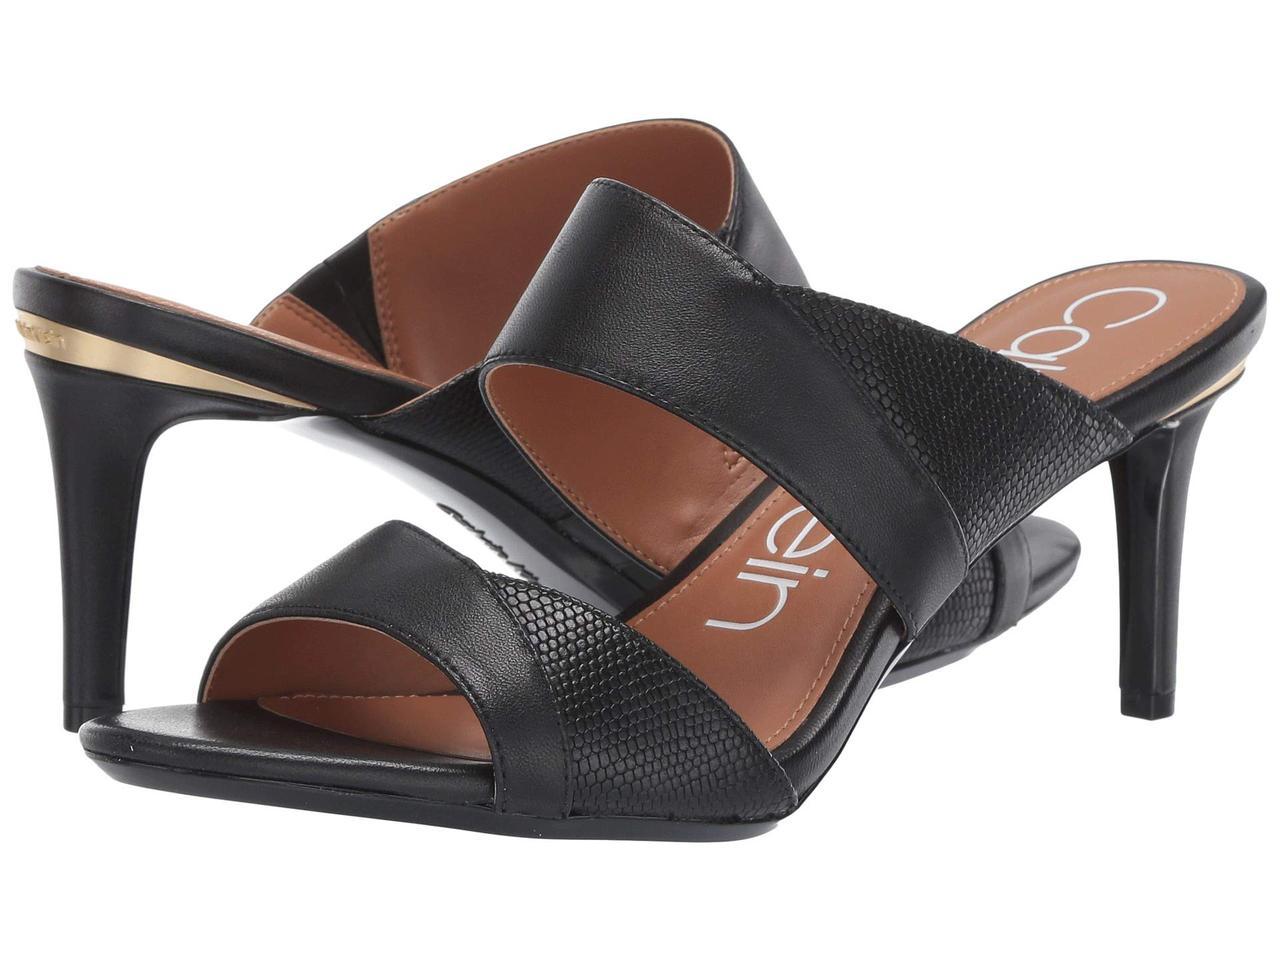 3a2839c98 Туфли на каблуке (Оригинал) Calvin Klein Lynnae Black Nappa/Shiny Lizard -  TopUSA